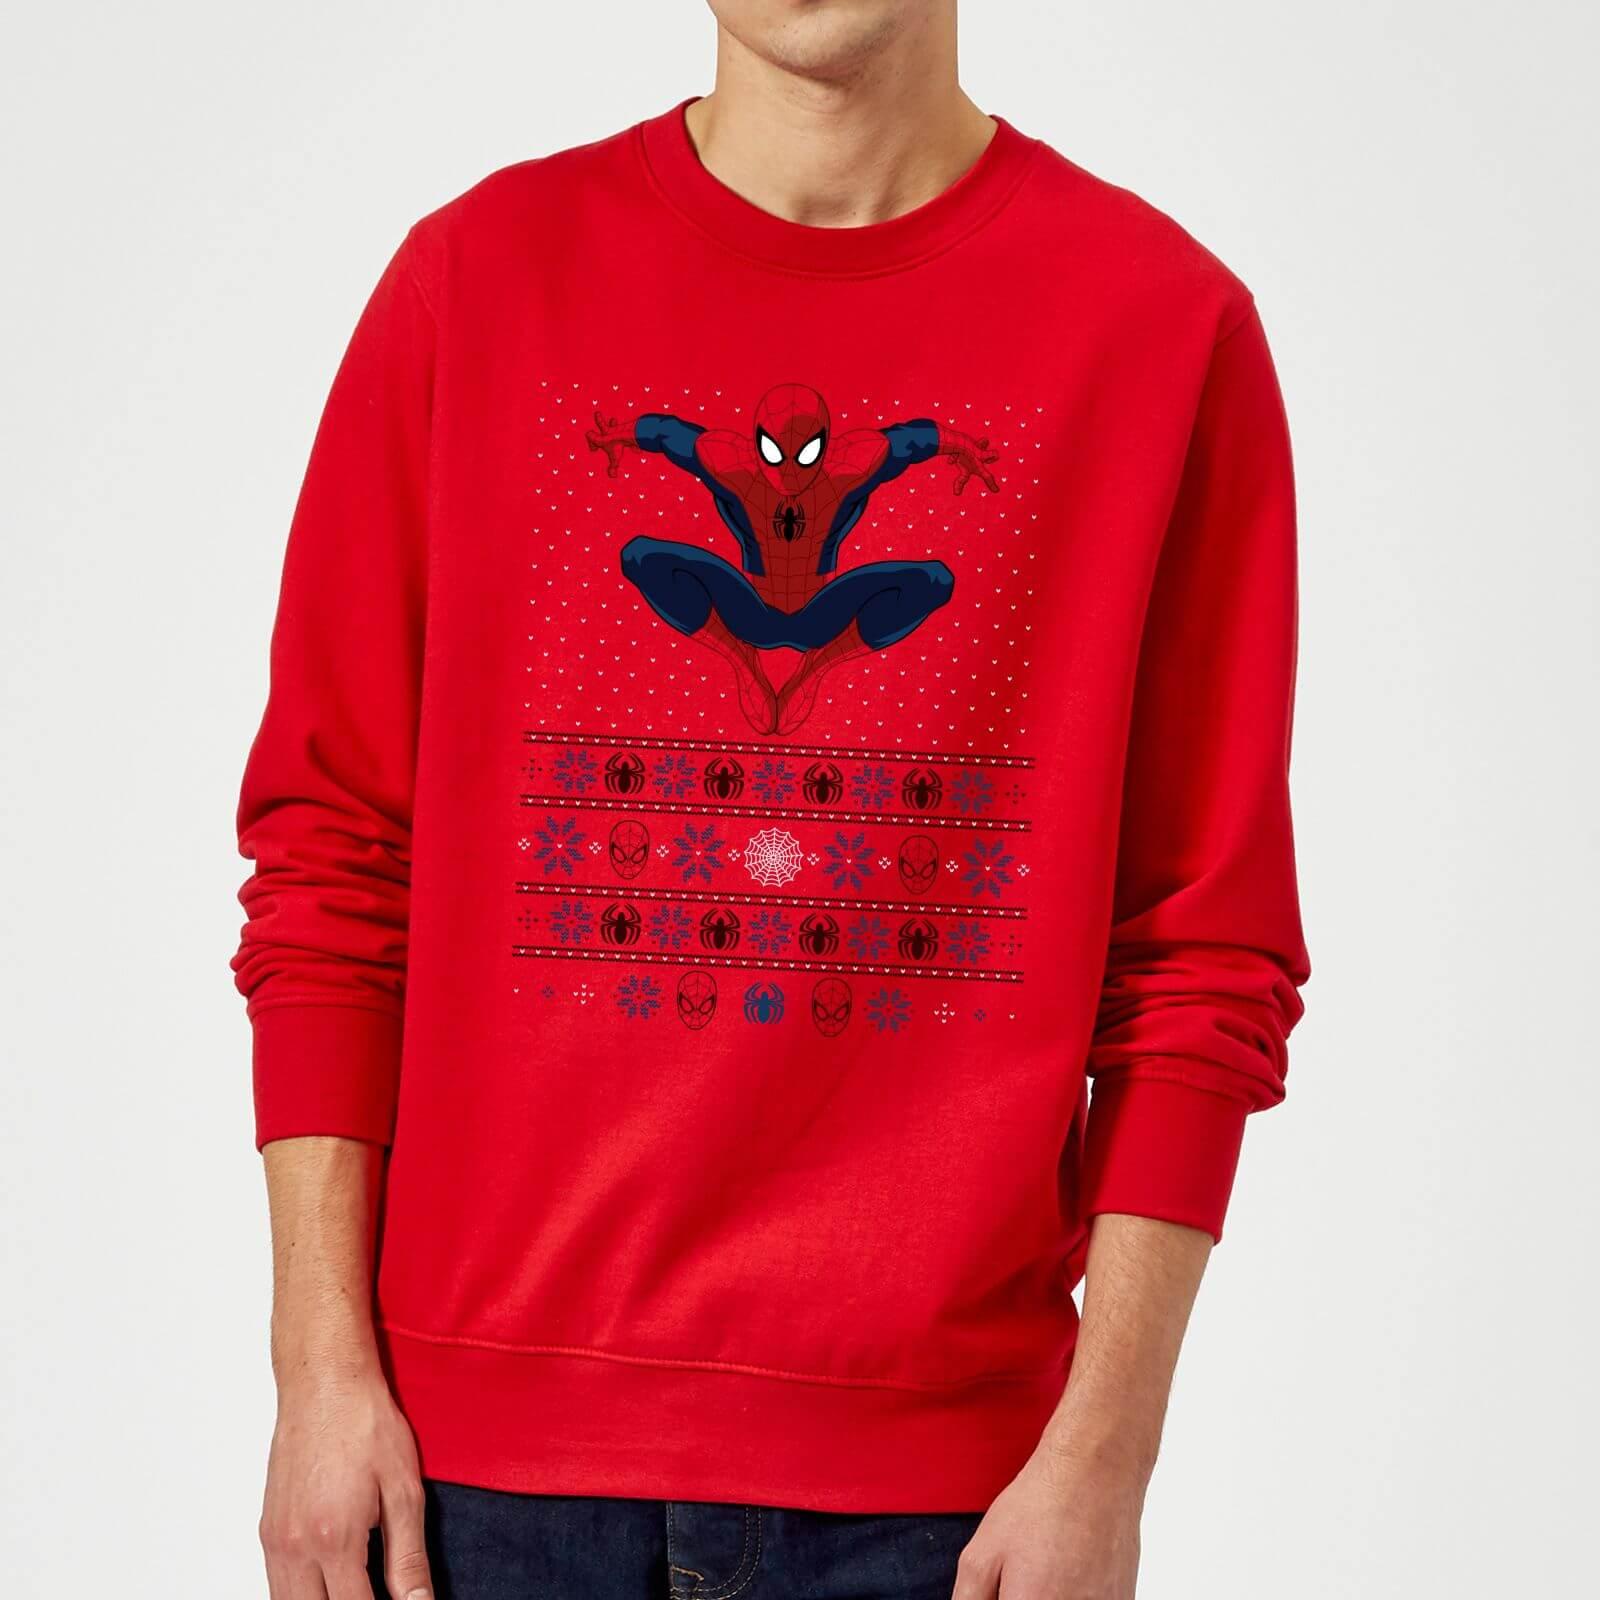 Marvel Avengers Spider-Man Christmas Sweatshirt - Red - XL - Red